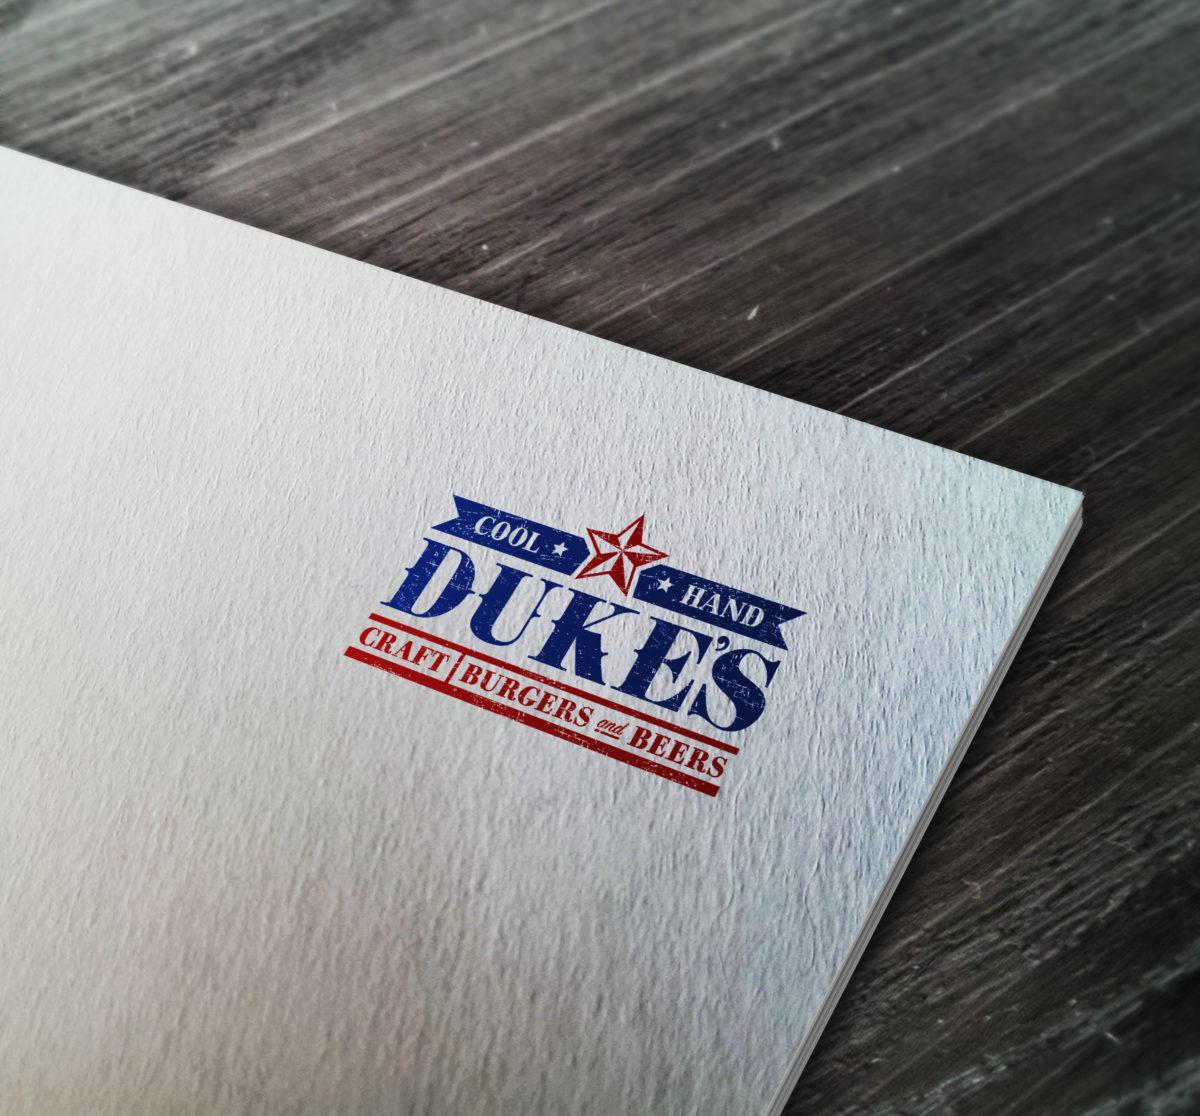 cool-hand-dukes-logo-paper-mockup